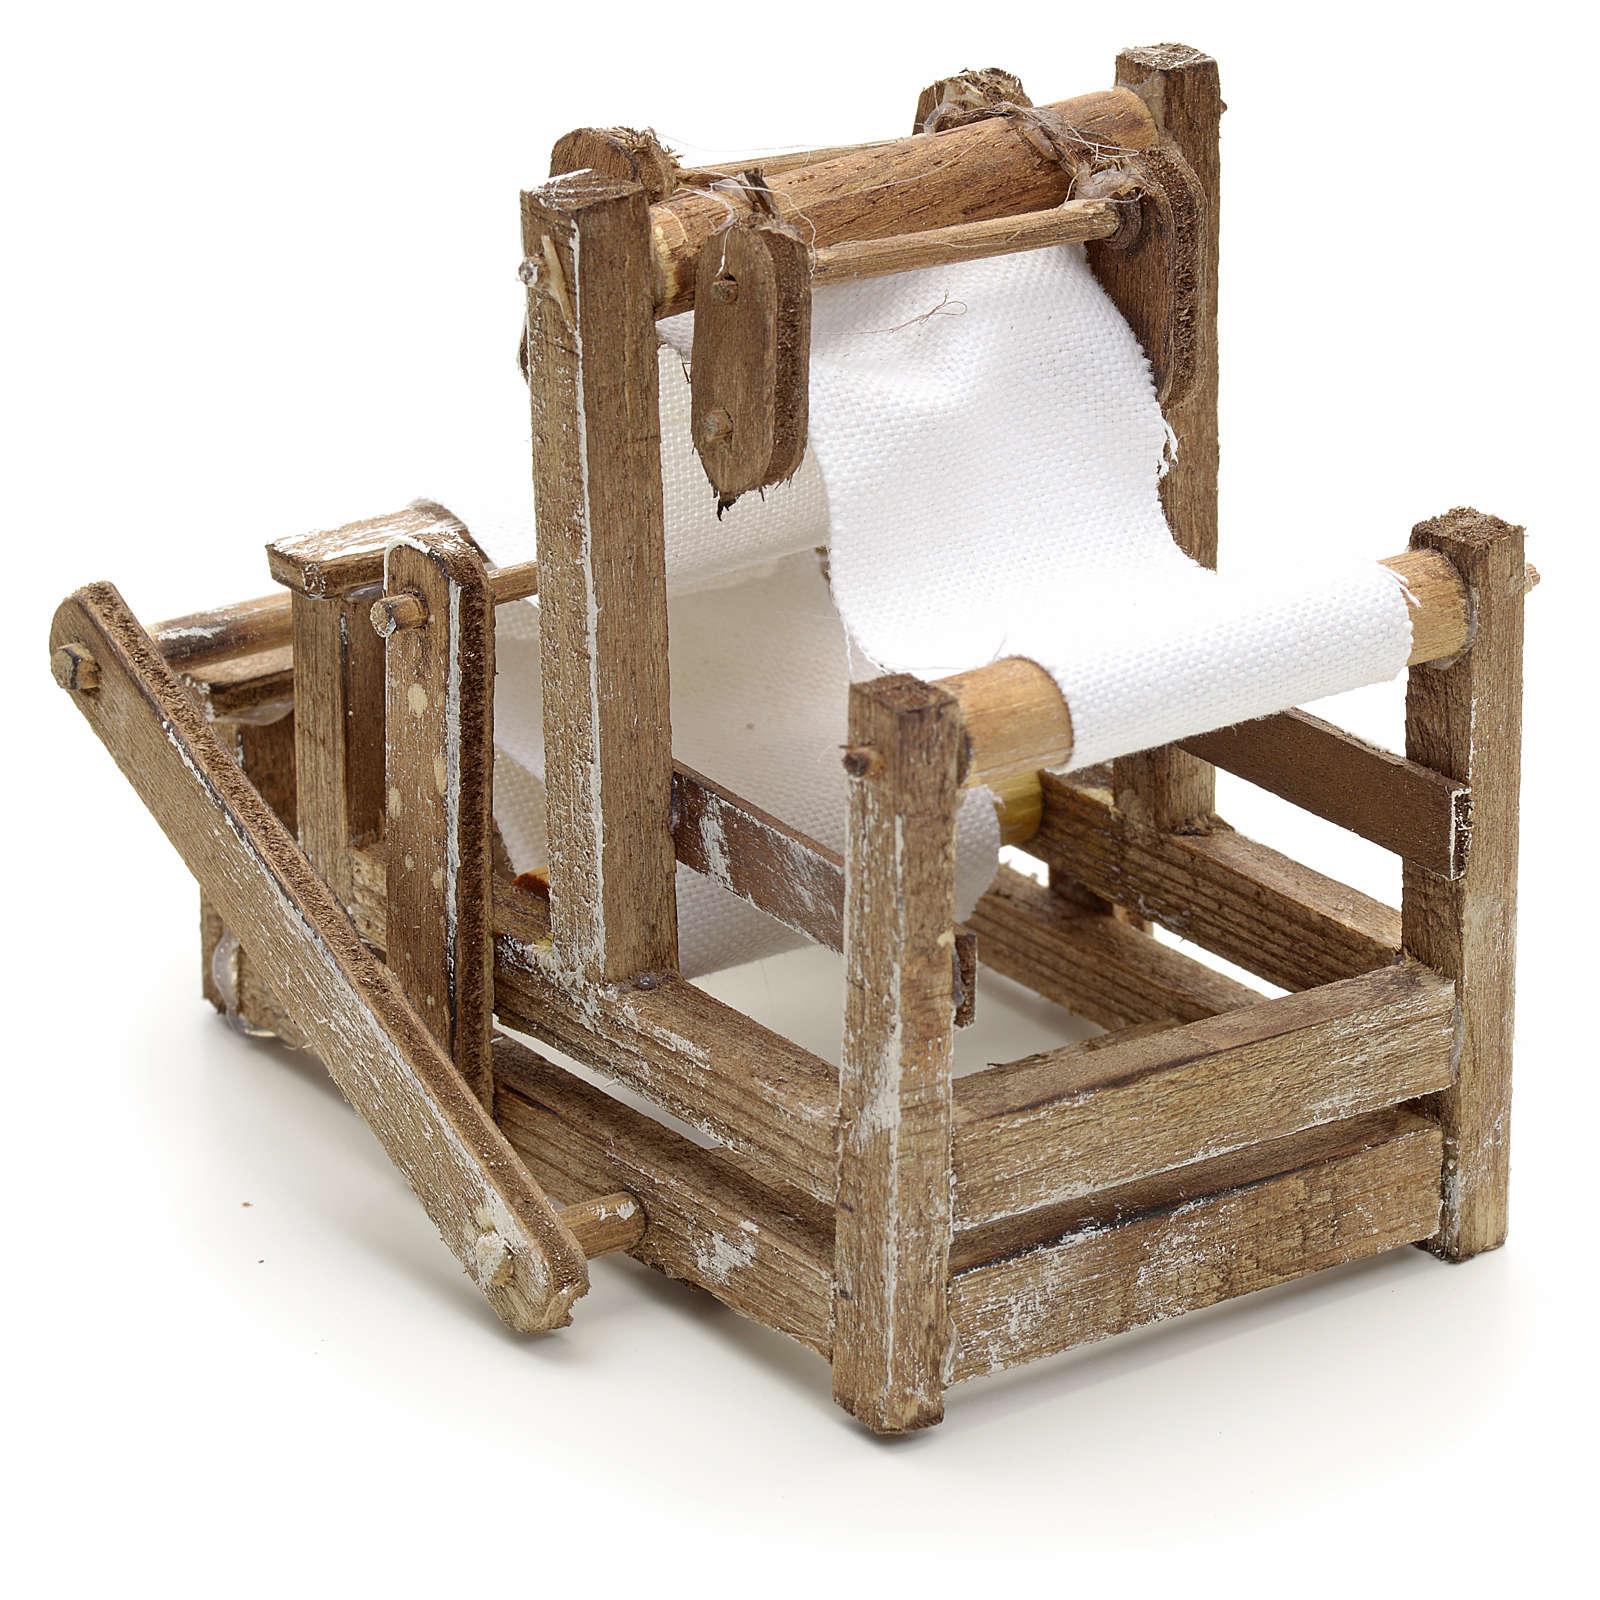 Telaio in legno presepe napoletano 4